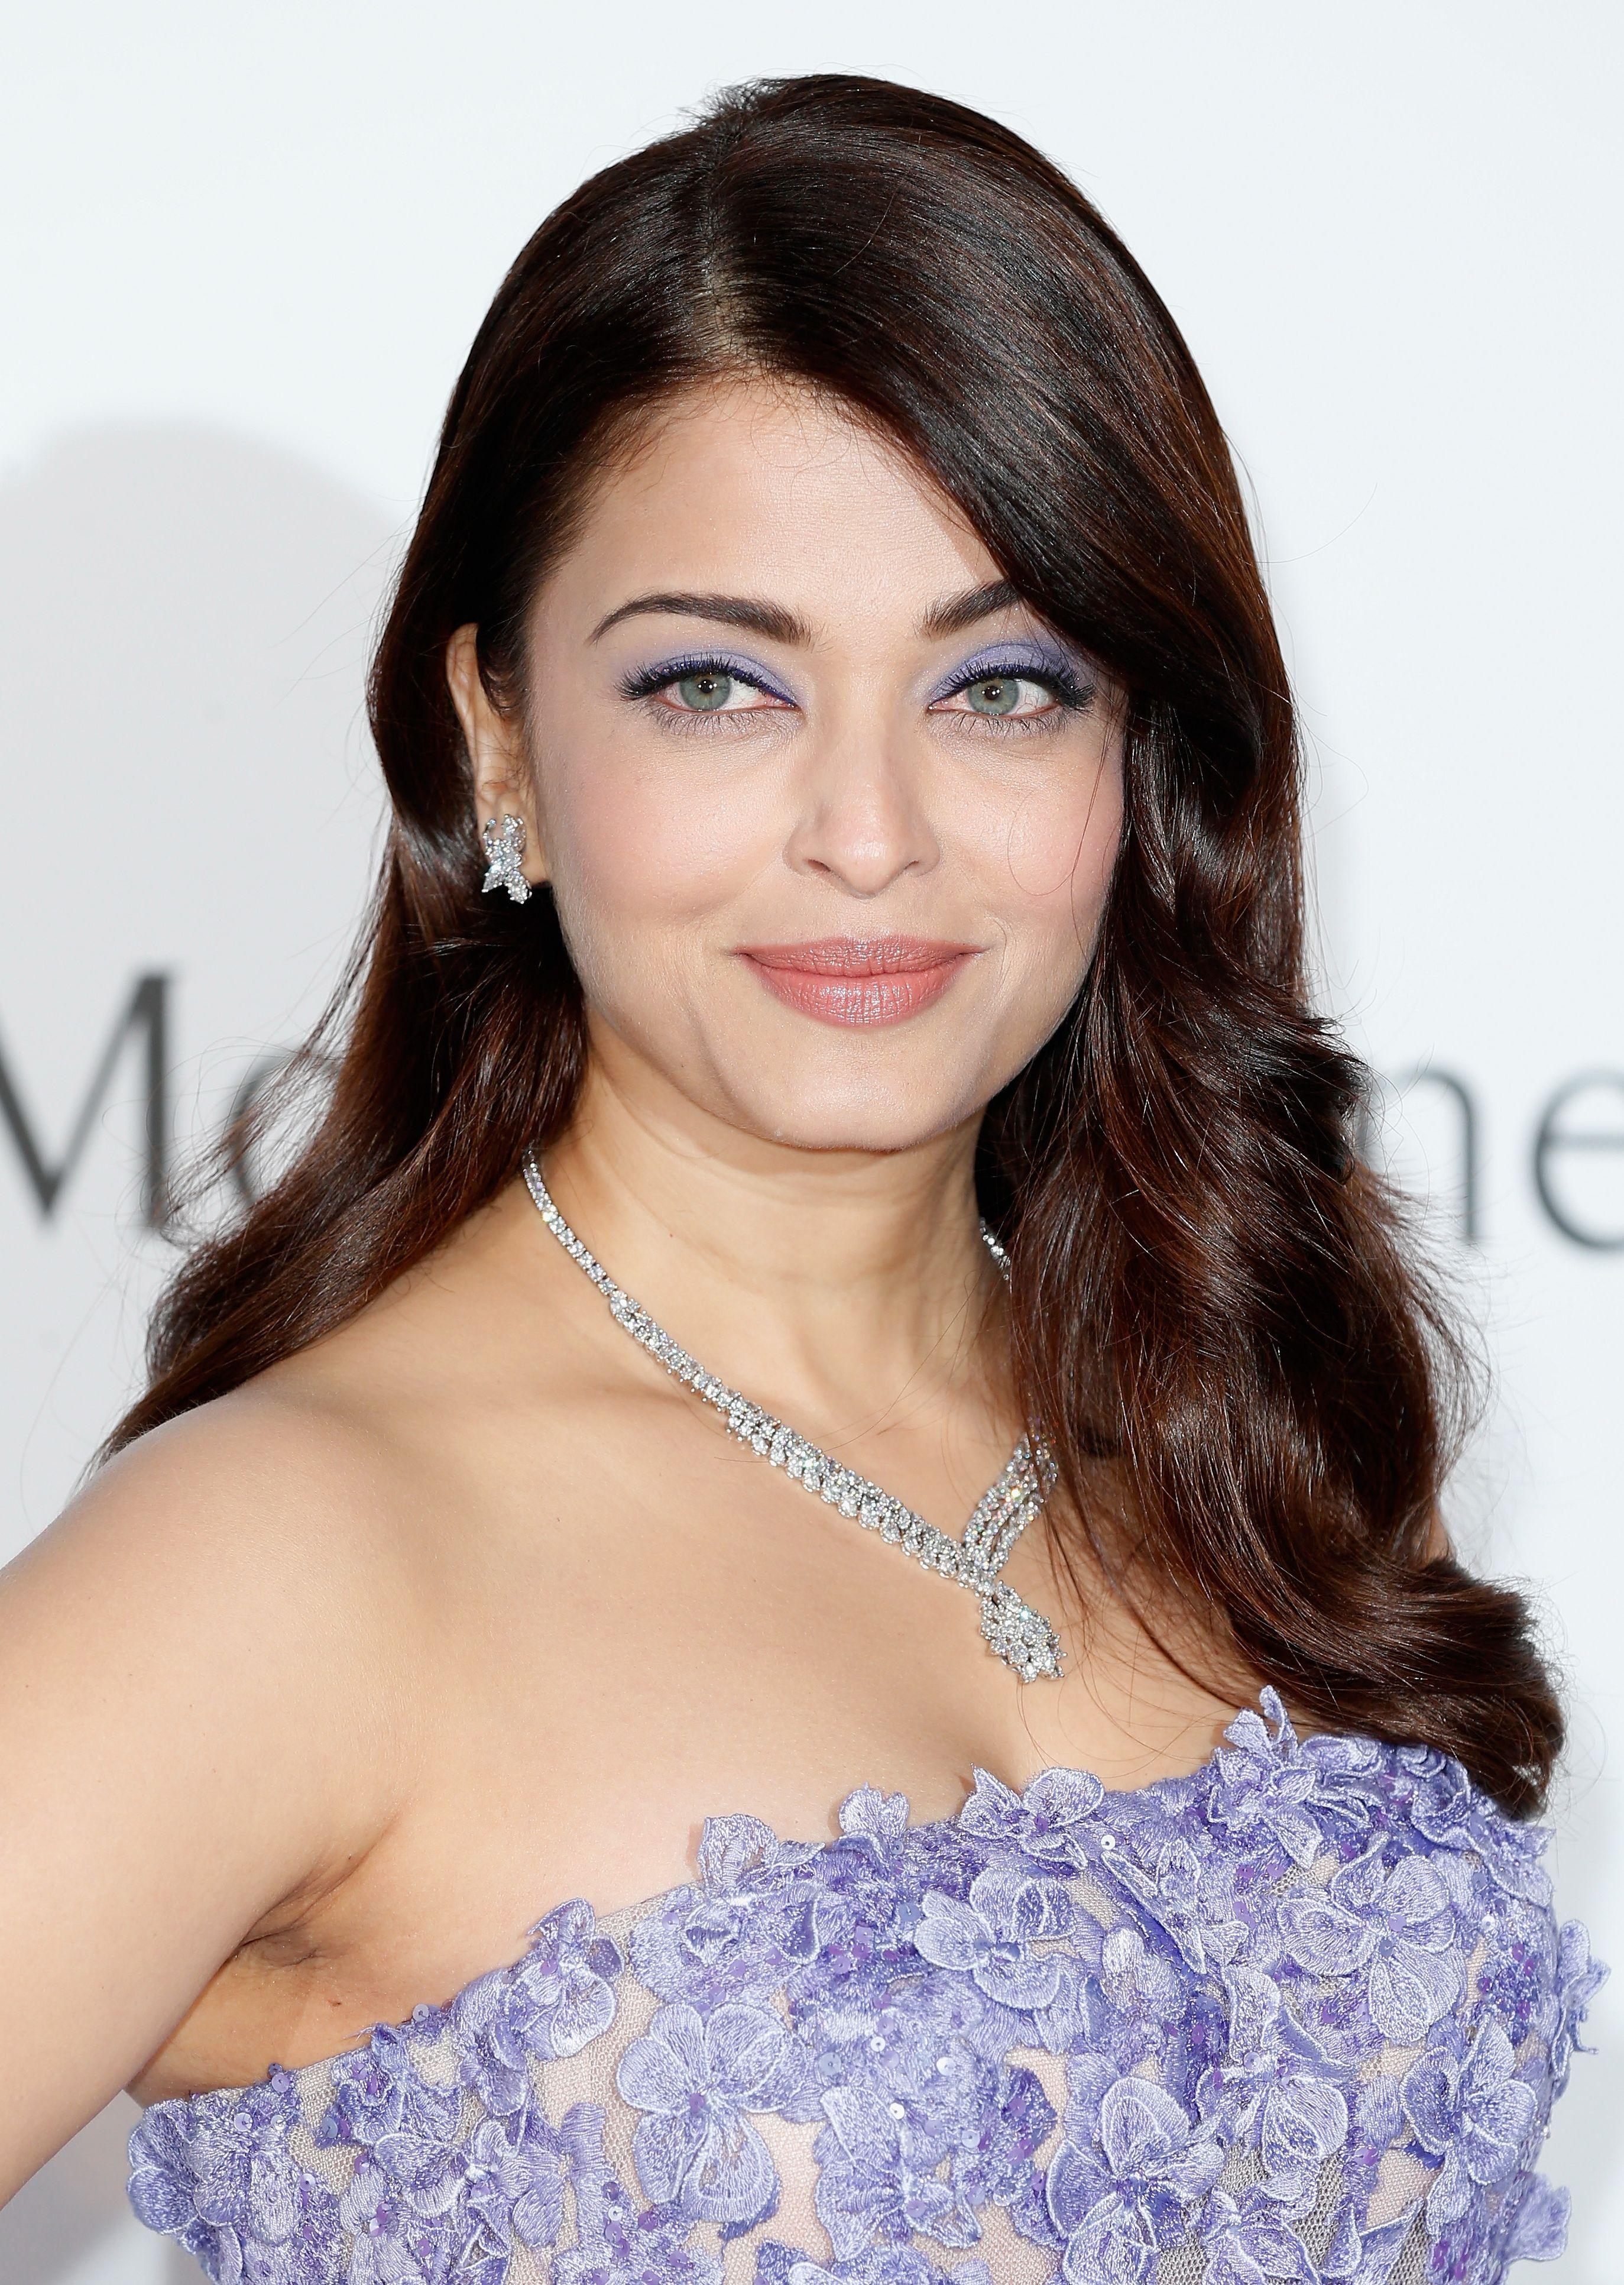 Aishwarya Rai Bachchan Berühmte schönheit, Frau